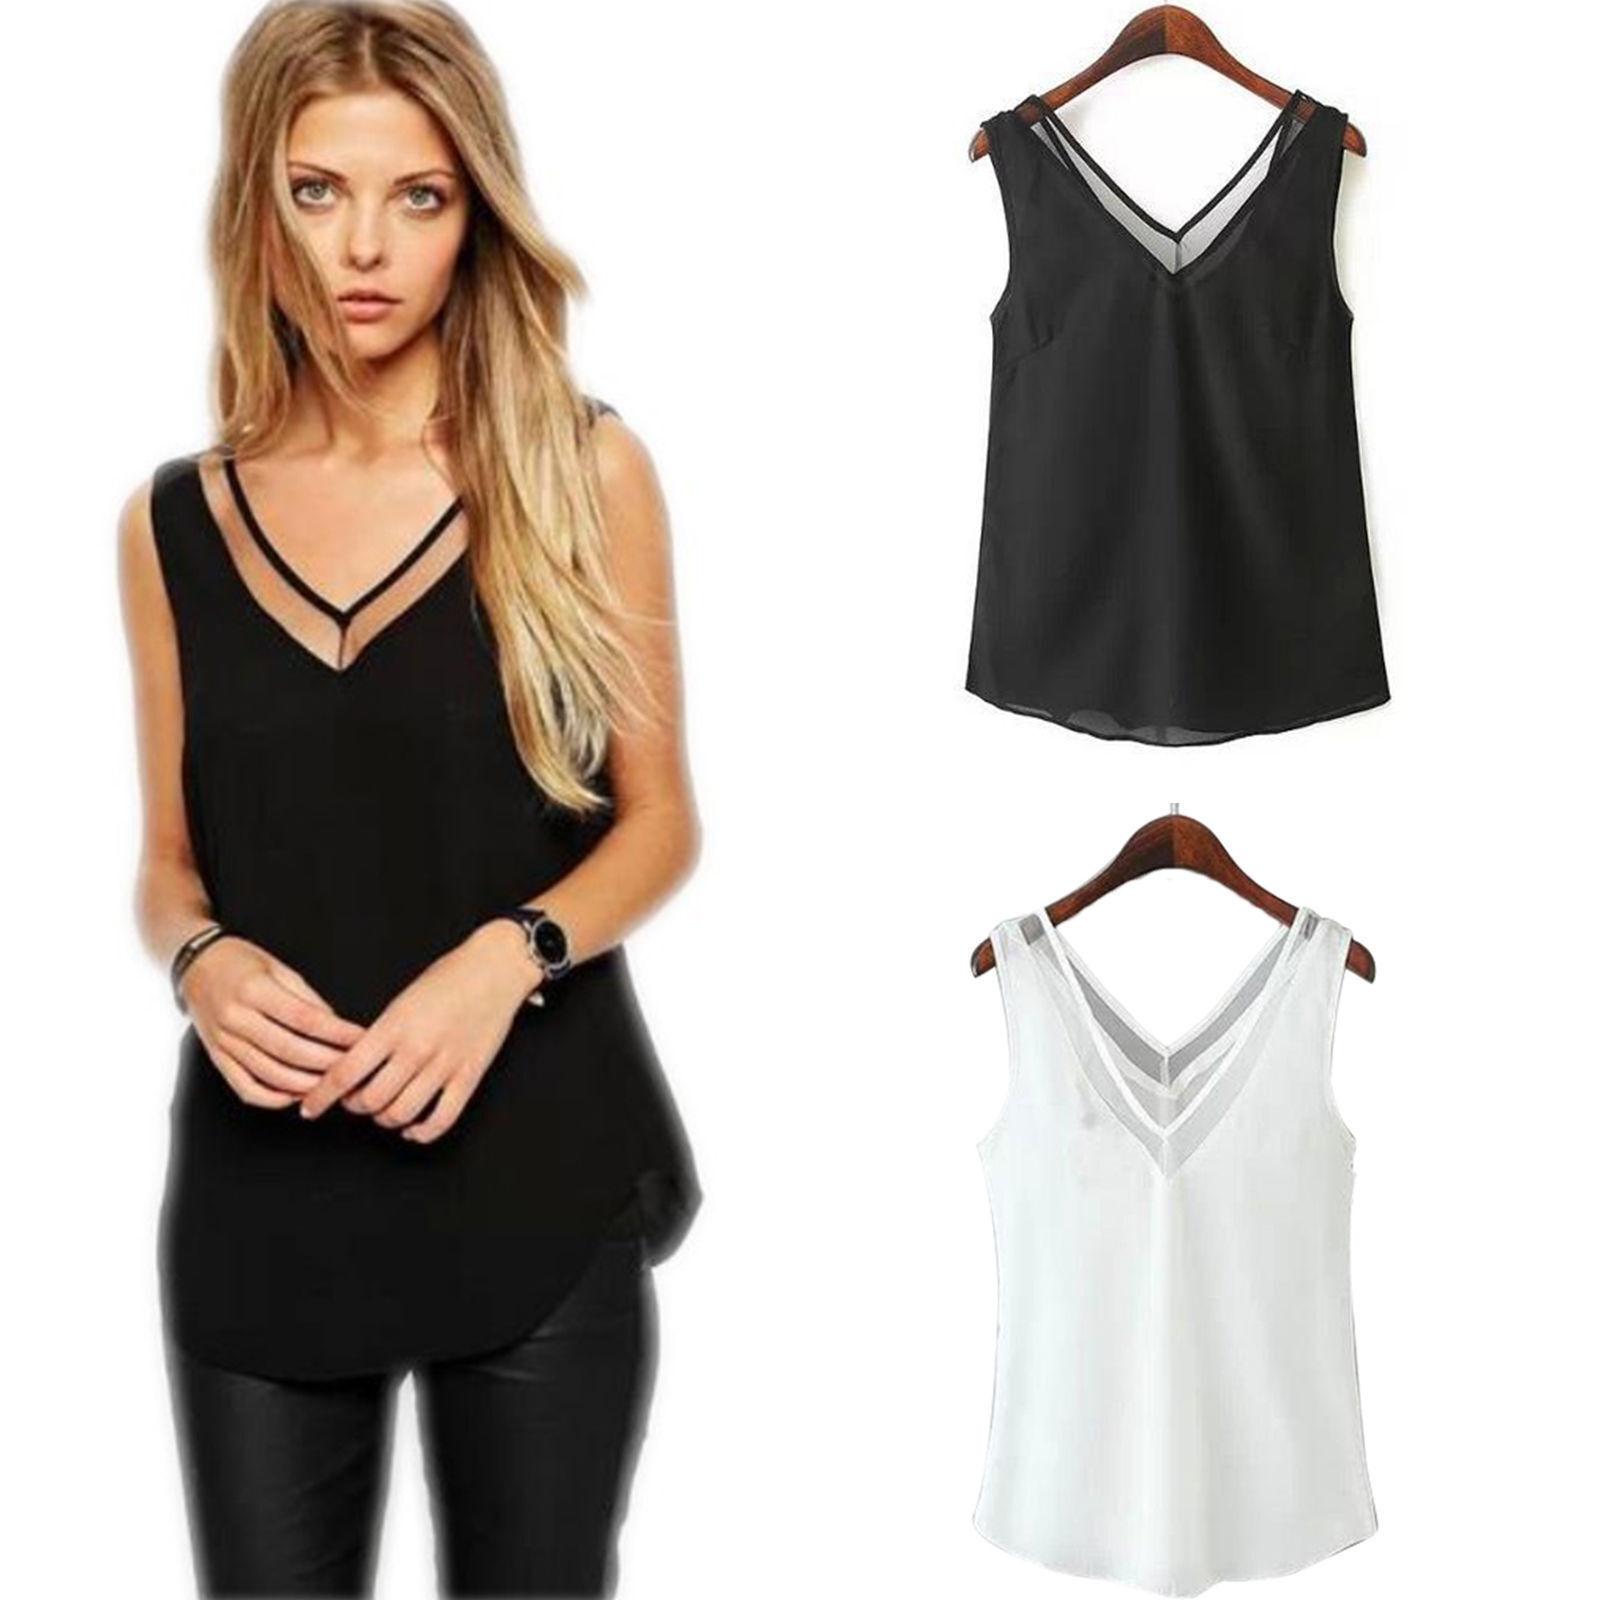 women lady chiffon v neck summer top tank blouse sleeveless